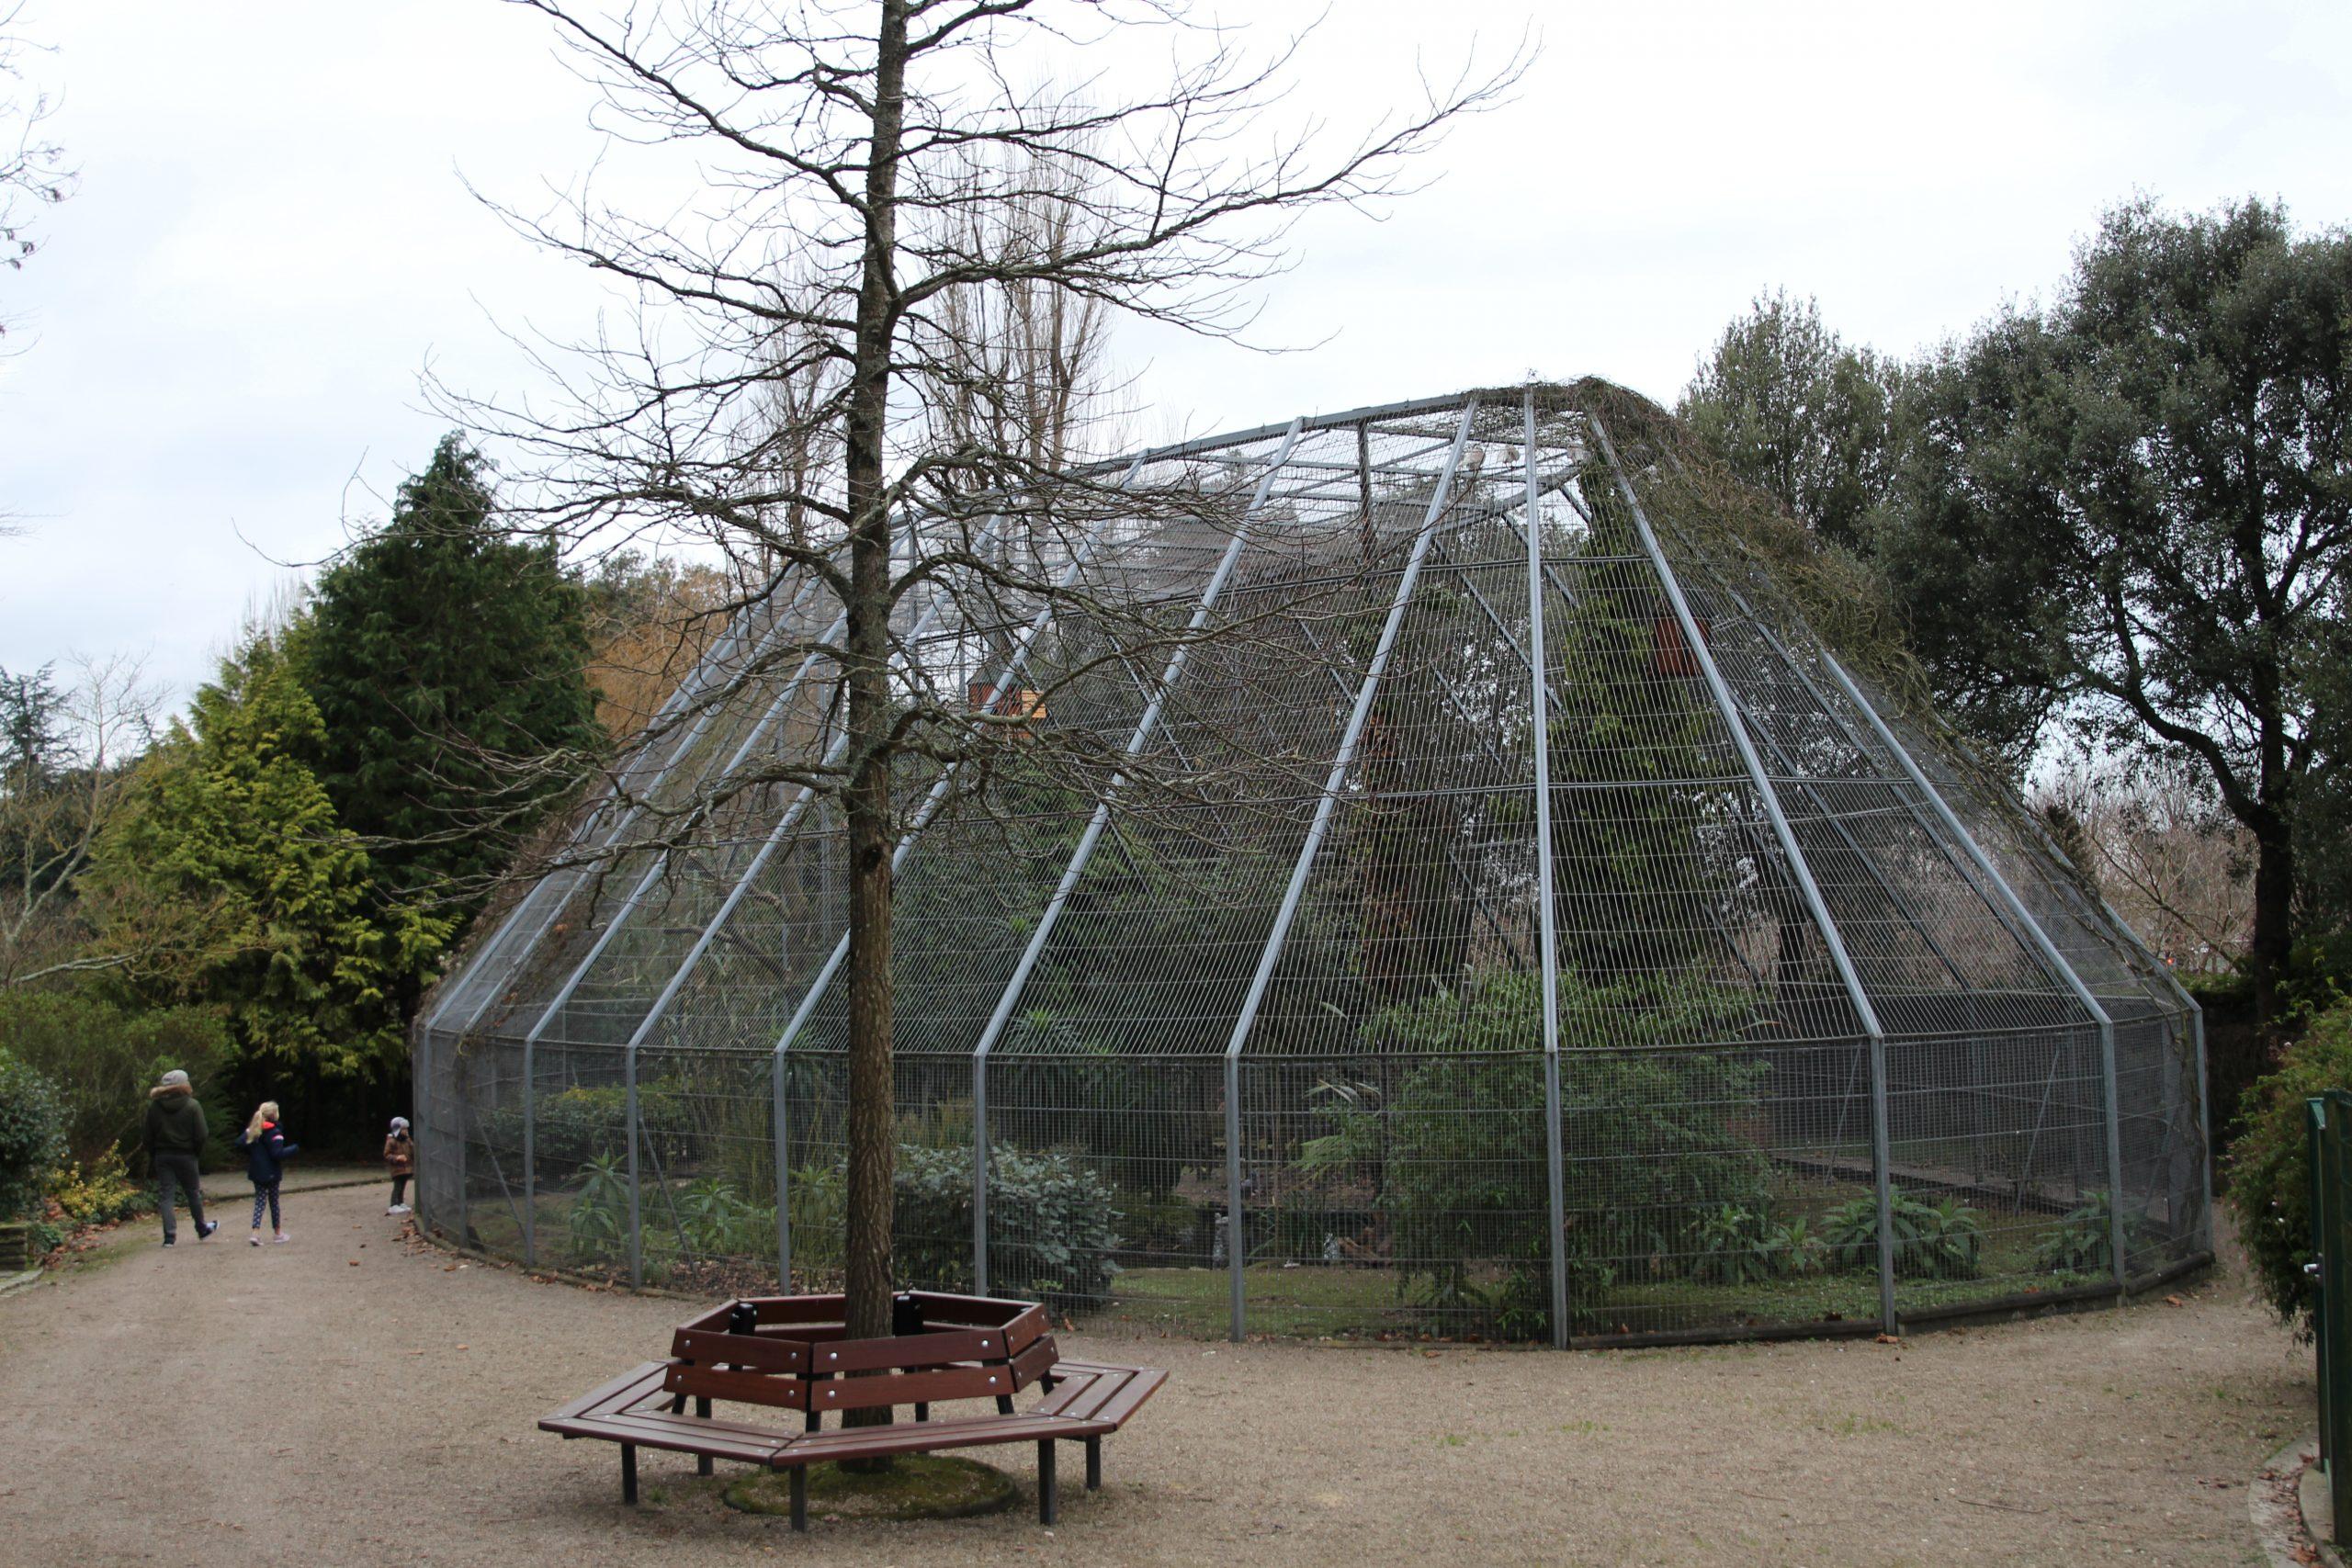 File:jardin Public De Cherbourg - Volière.jpg - Wikimedia ... serapportantà Voliere De Jardin